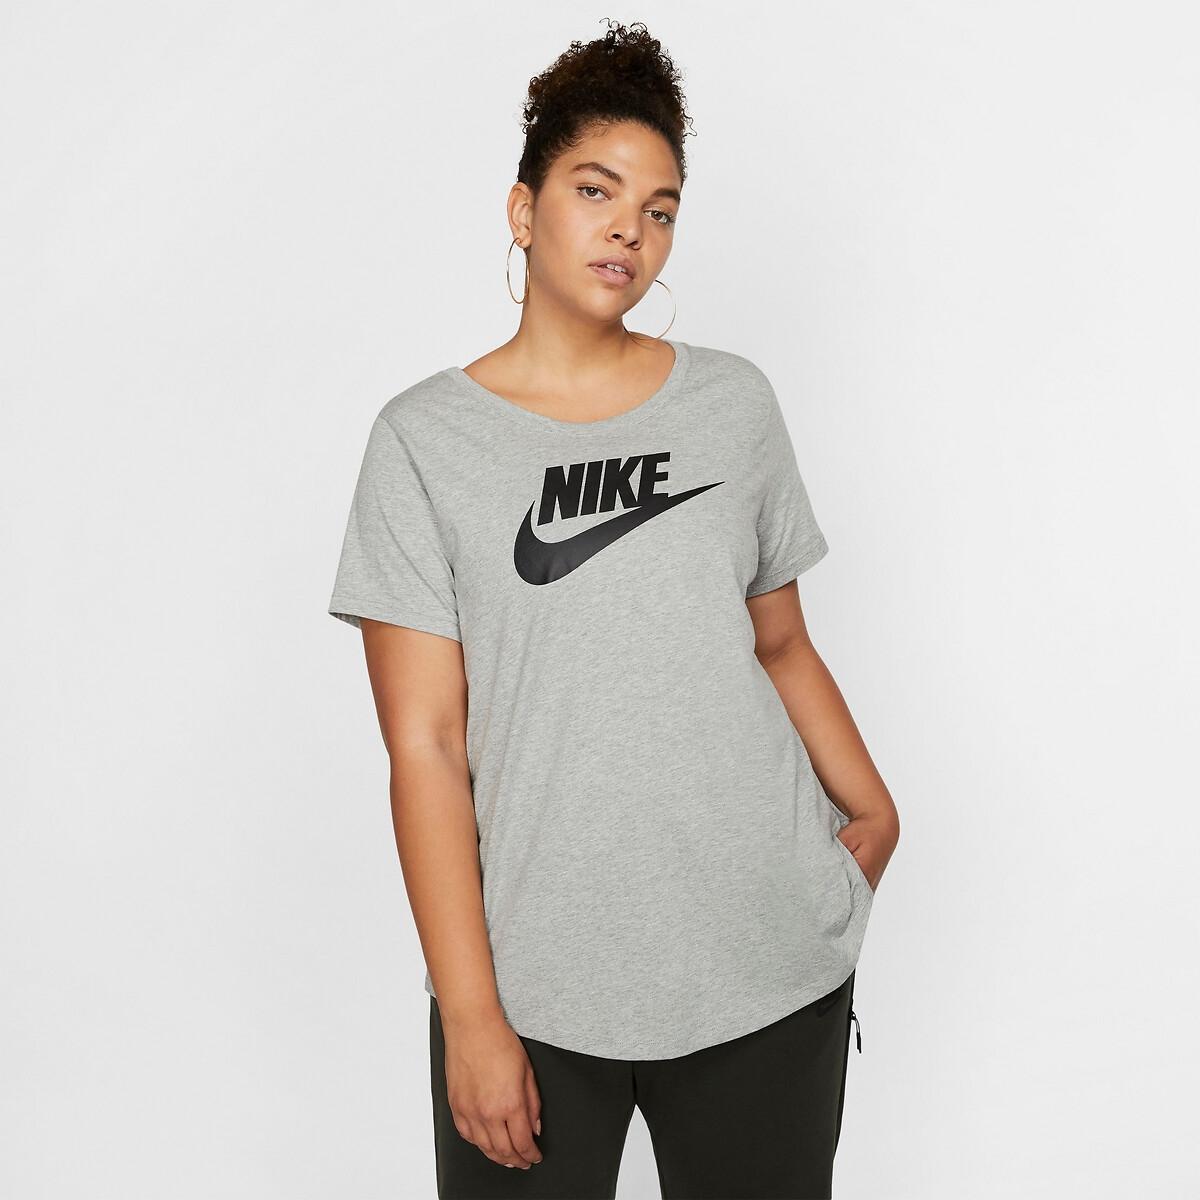 Camiseta de manga corta y cuello redondo